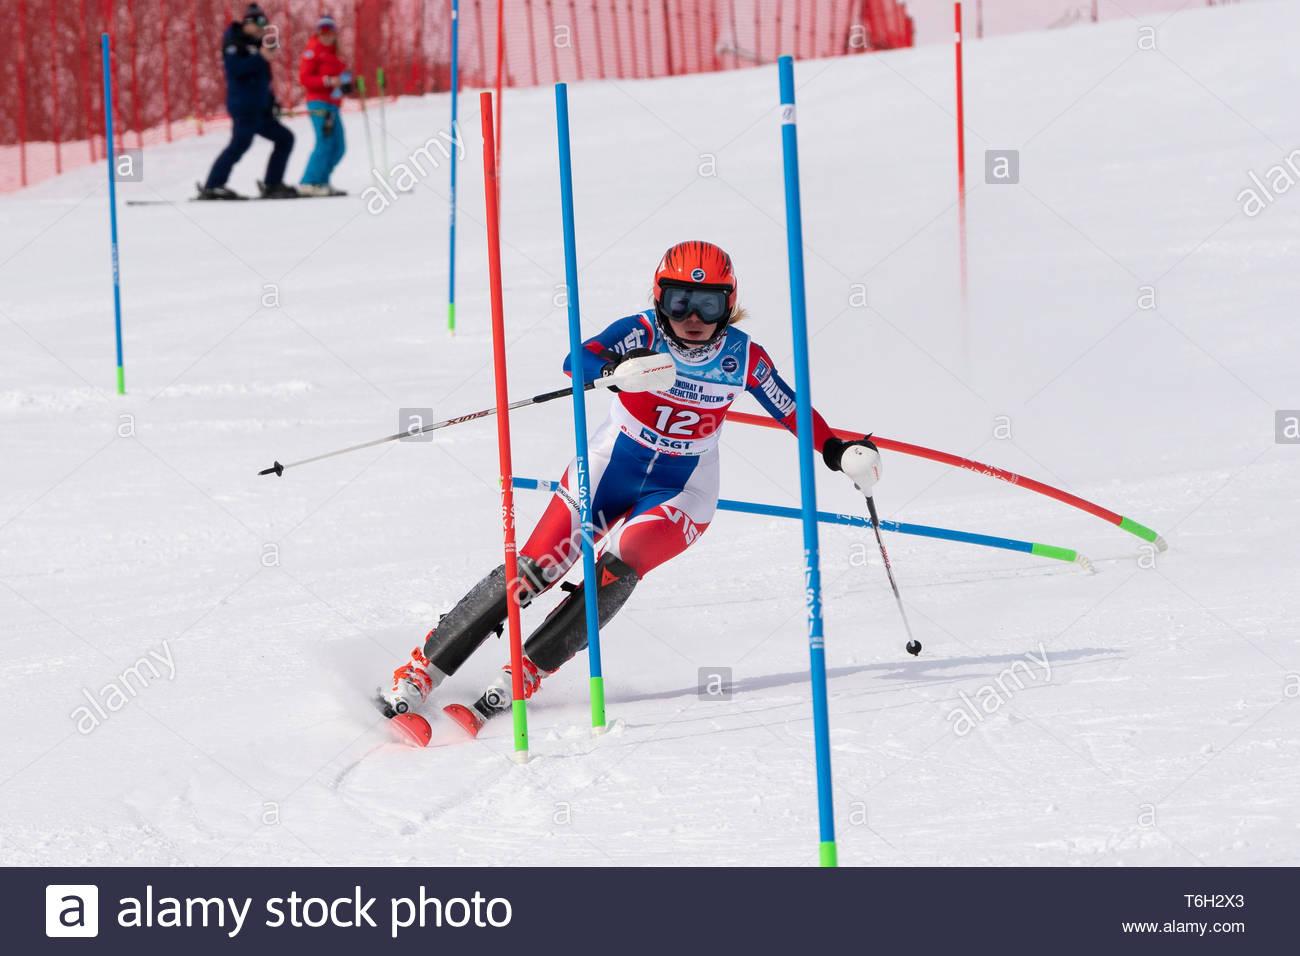 MOROZNAYA MOUNTAIN, KAMCHATKA PENINSULA, RUSSIA - MAR 28, 2019: Russian Alpine Skiing Championship, International Ski Federation Championship, slalom. - Stock Image